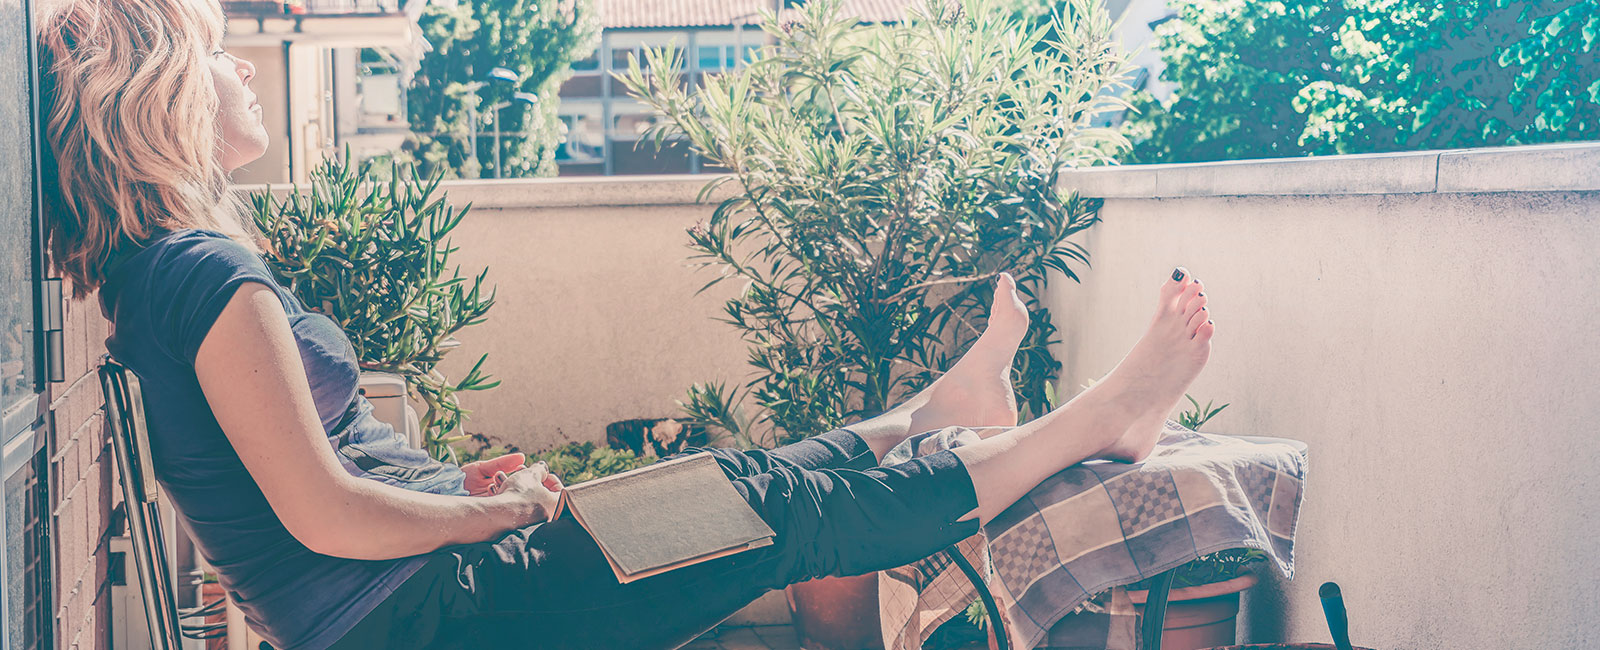 sonne balkon entspannen lesen